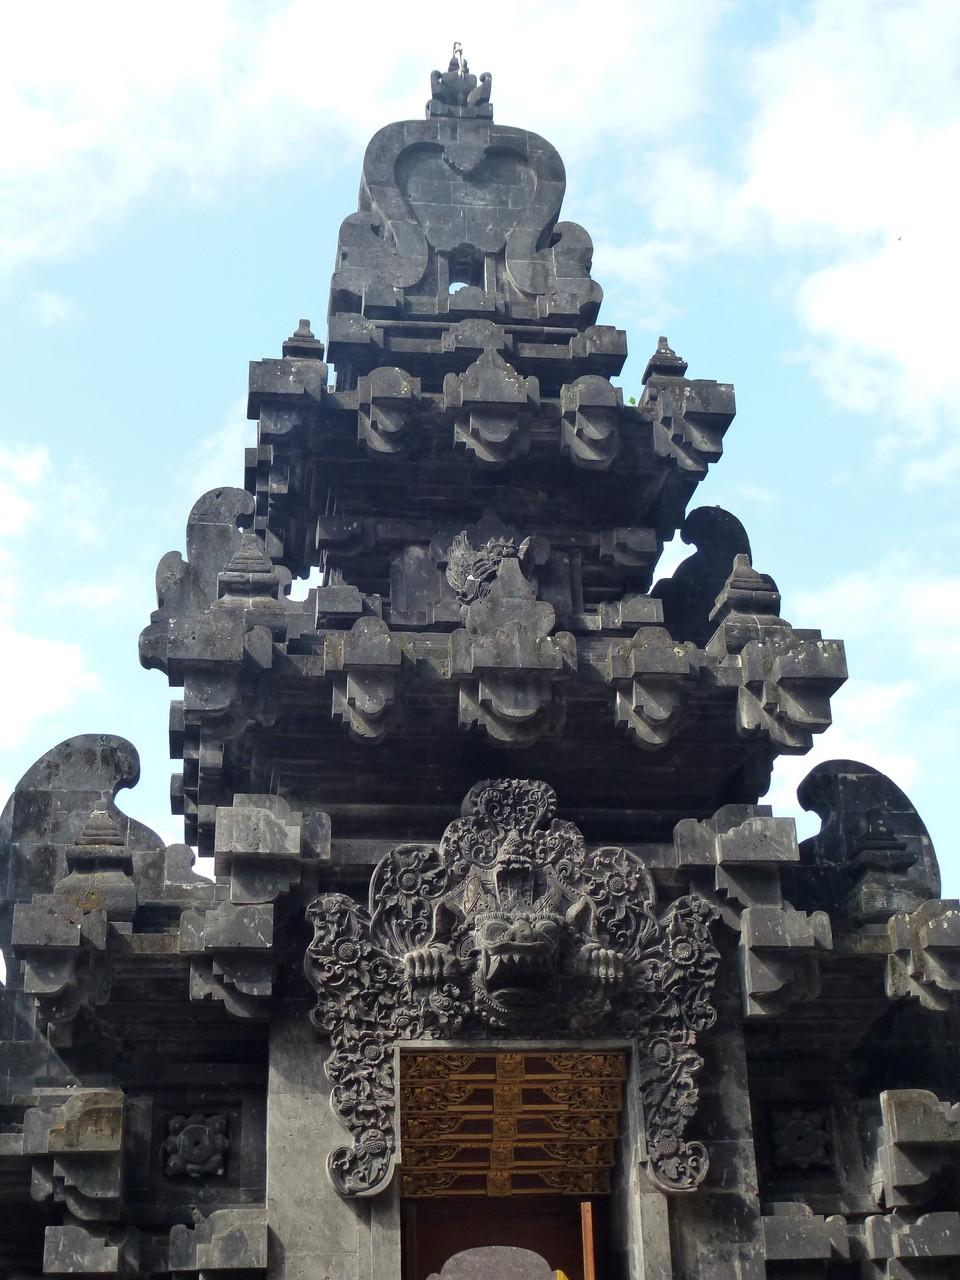 Rückseite des Eingangs